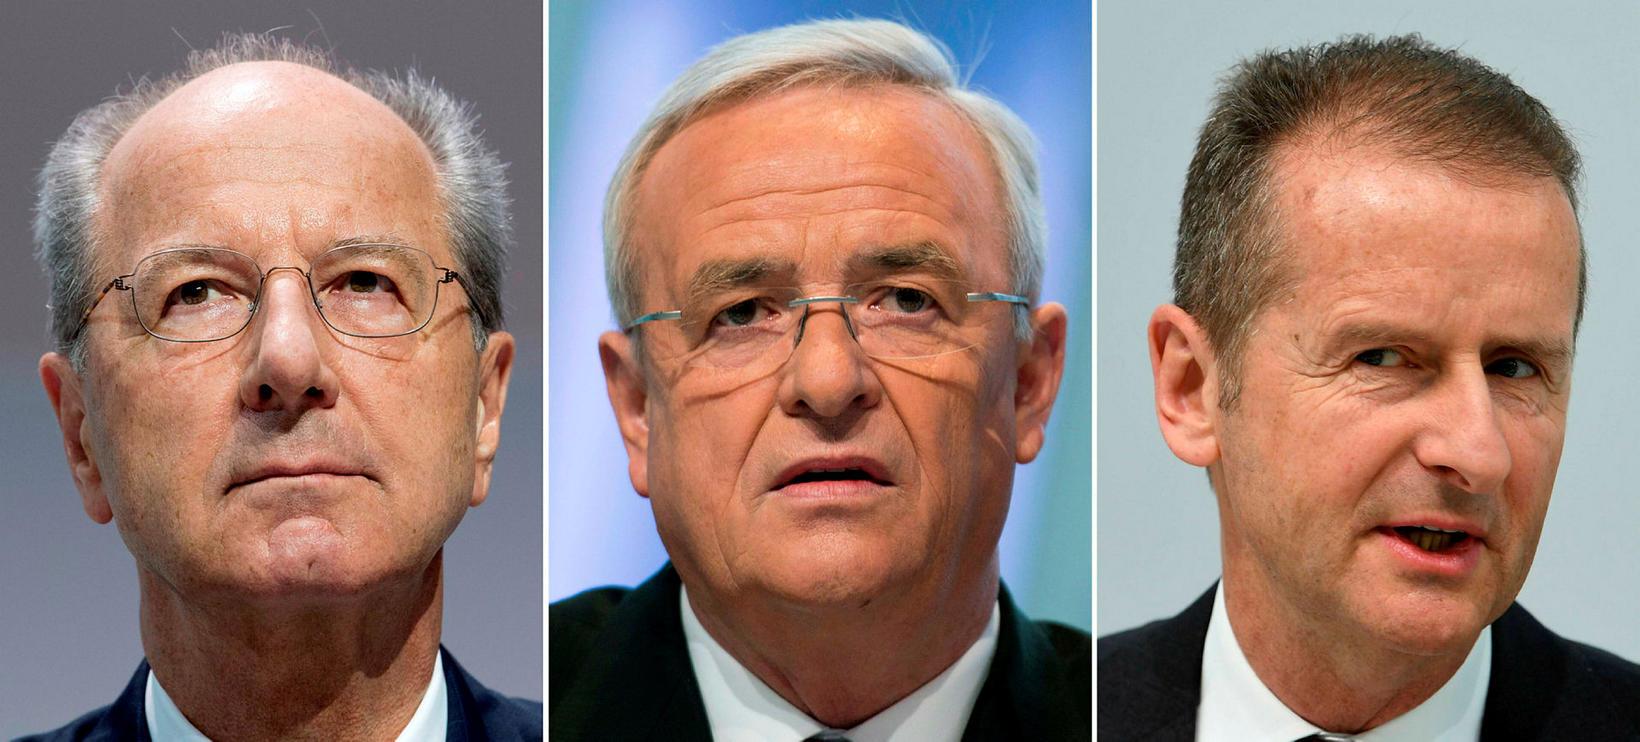 Hans Dieter Pötsch, stjórnarformaður Volkswagen, Martin Winterkorn, fyrrverandi forstjóri VW, …